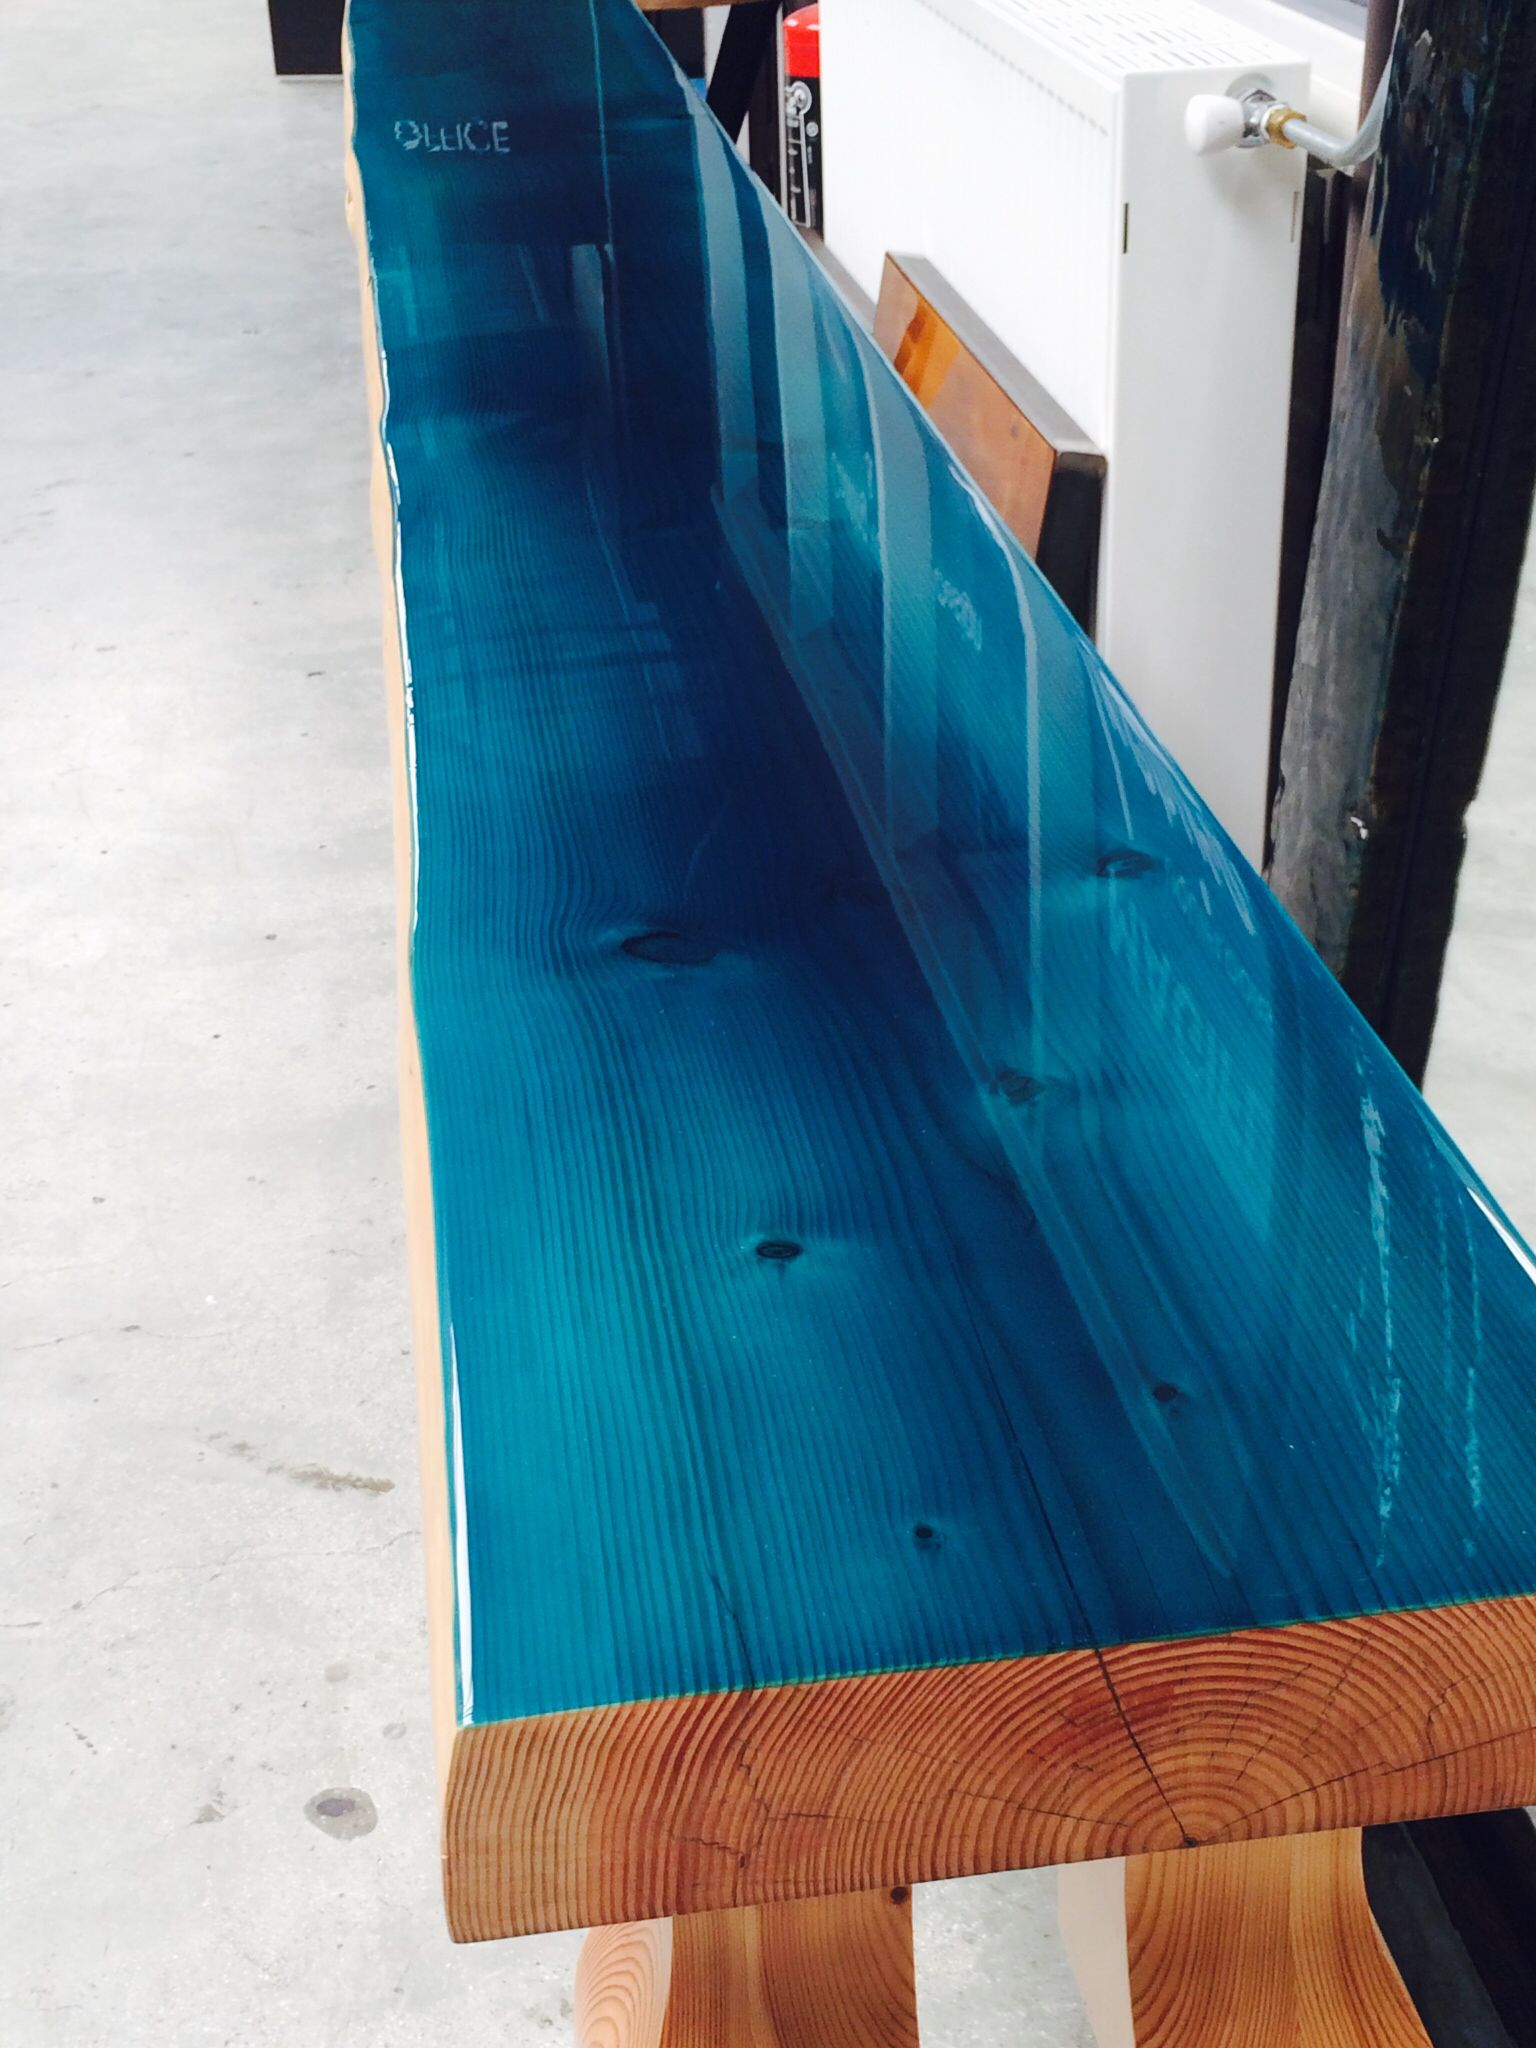 Ocean Blue Furniture